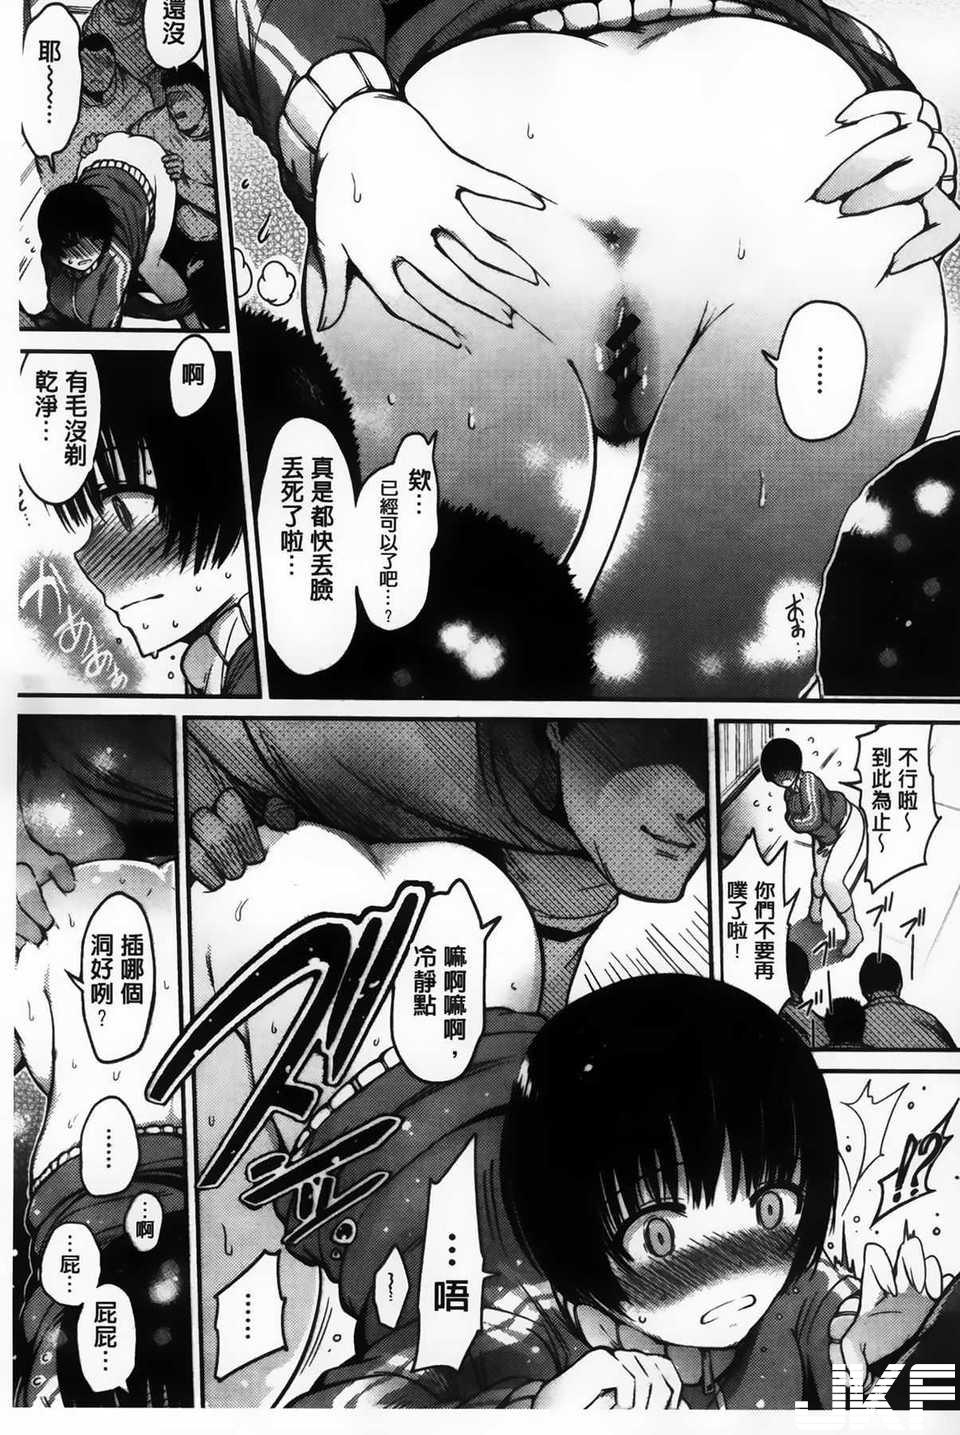 AoJiaoZero_077.jpg